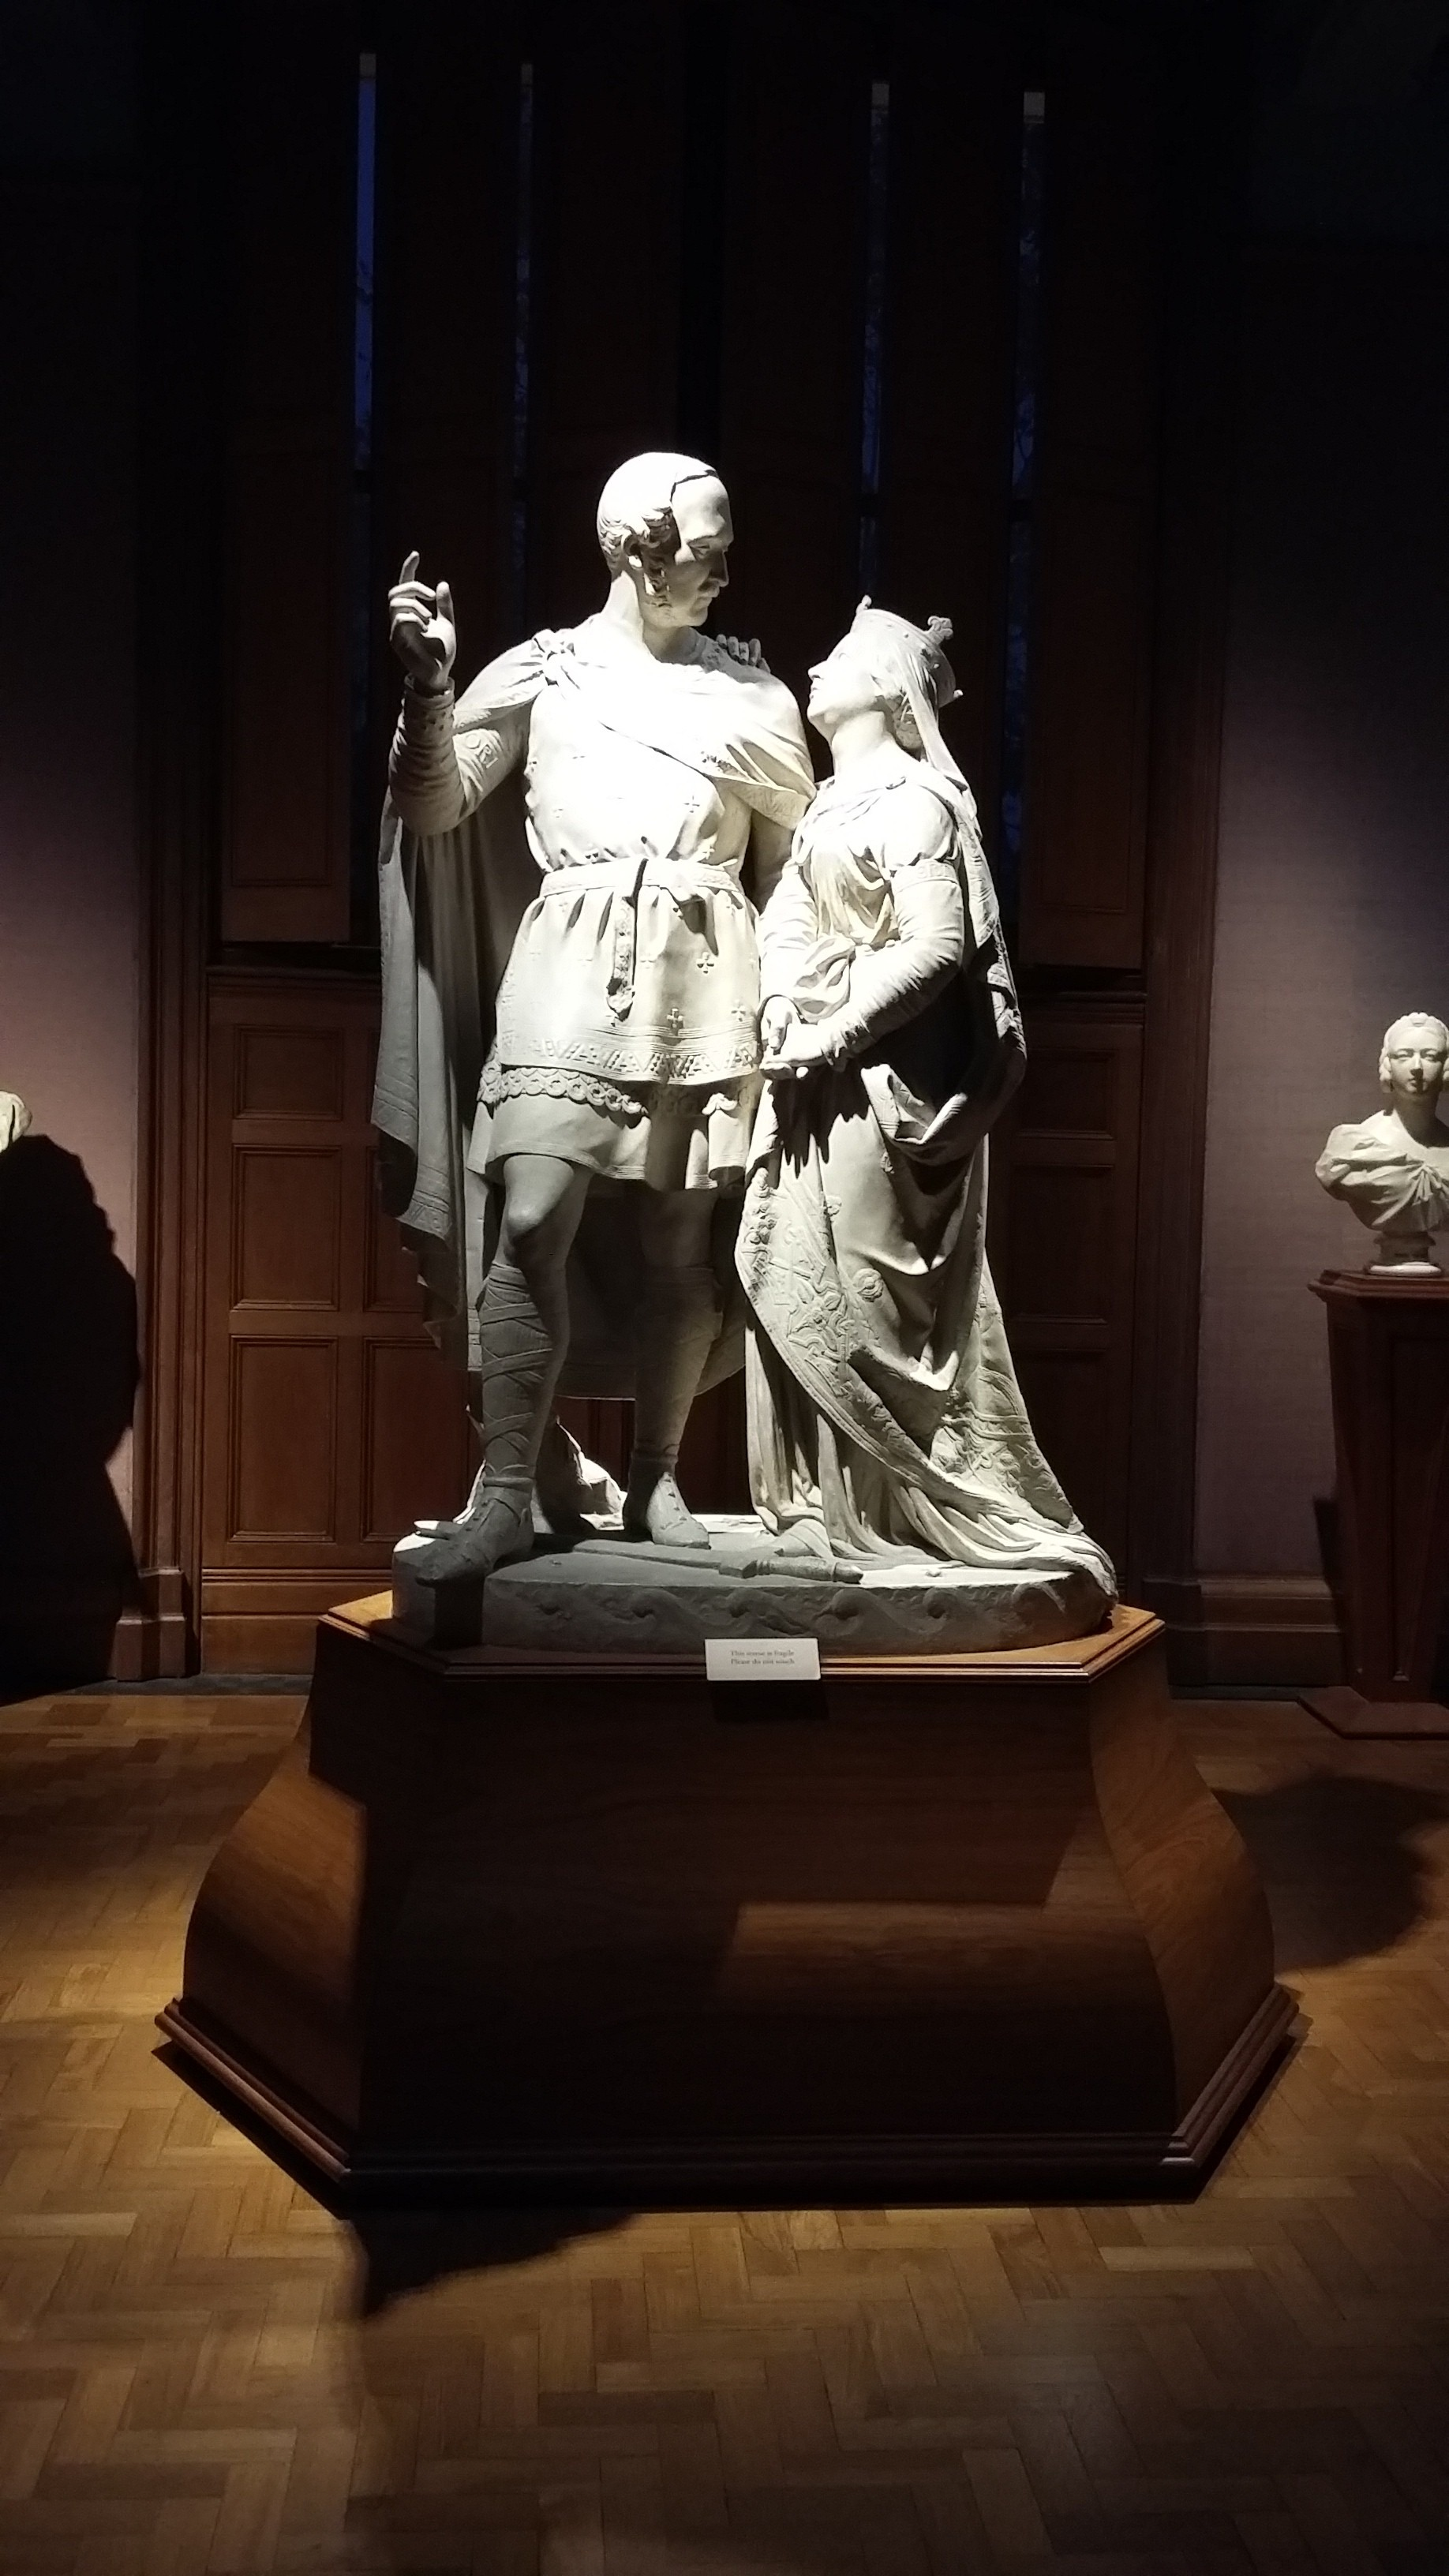 Statue of Victoria and Albert